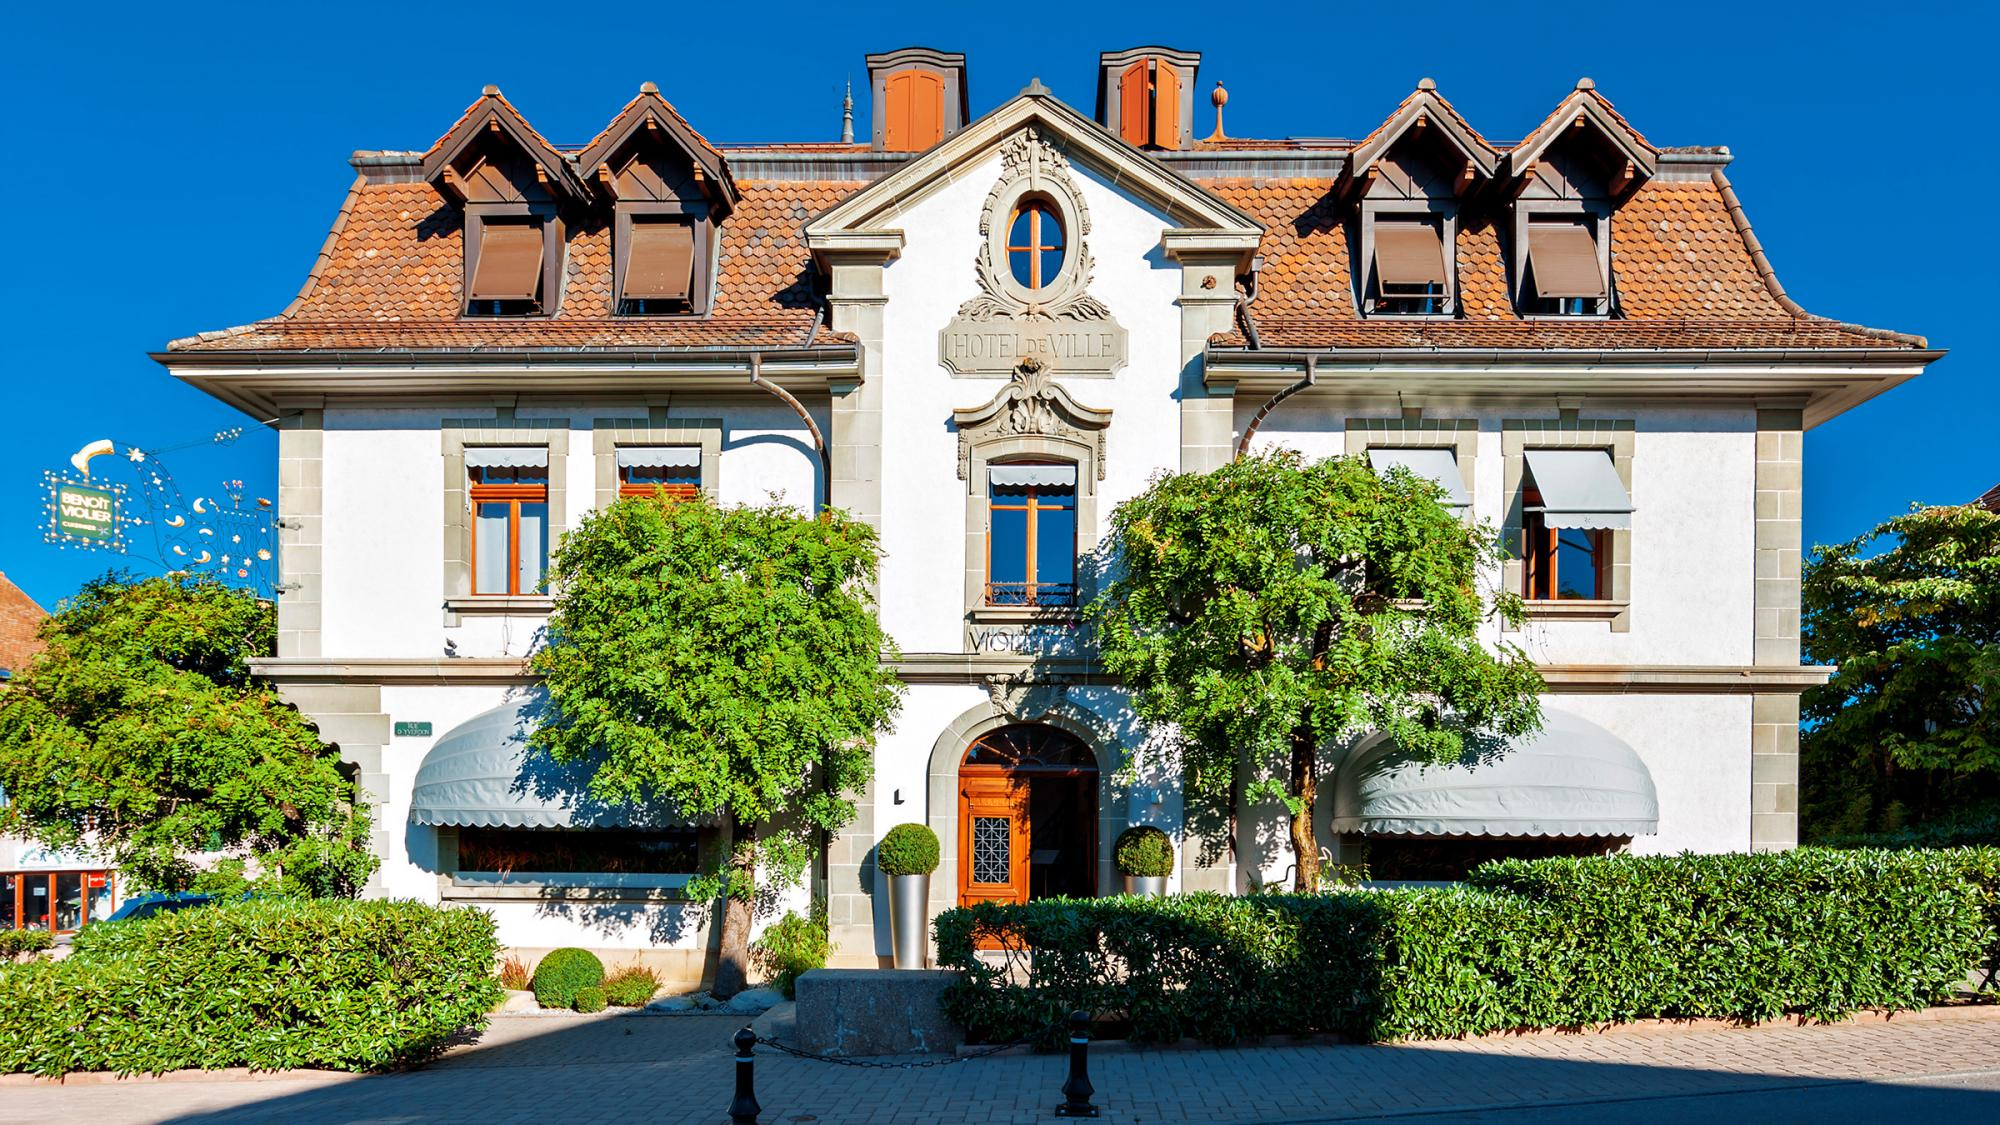 Hotel De Ville, Crissier, Swiss